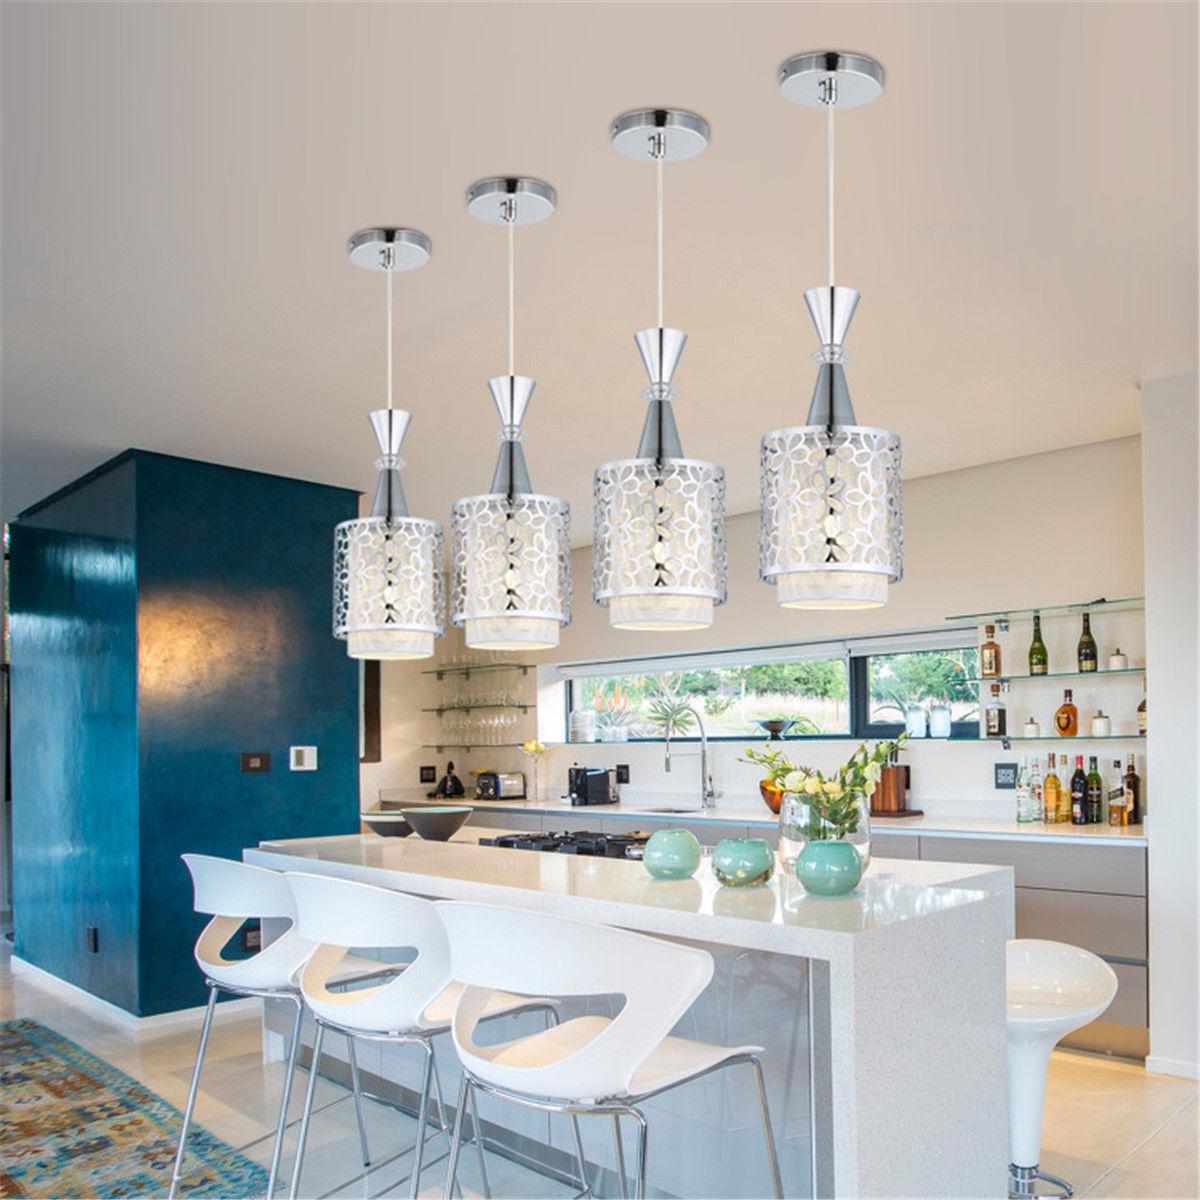 3PCS Modern Crystal Iron Ceiling Light Pendant Lamp Dining Room Chandelier  Decor